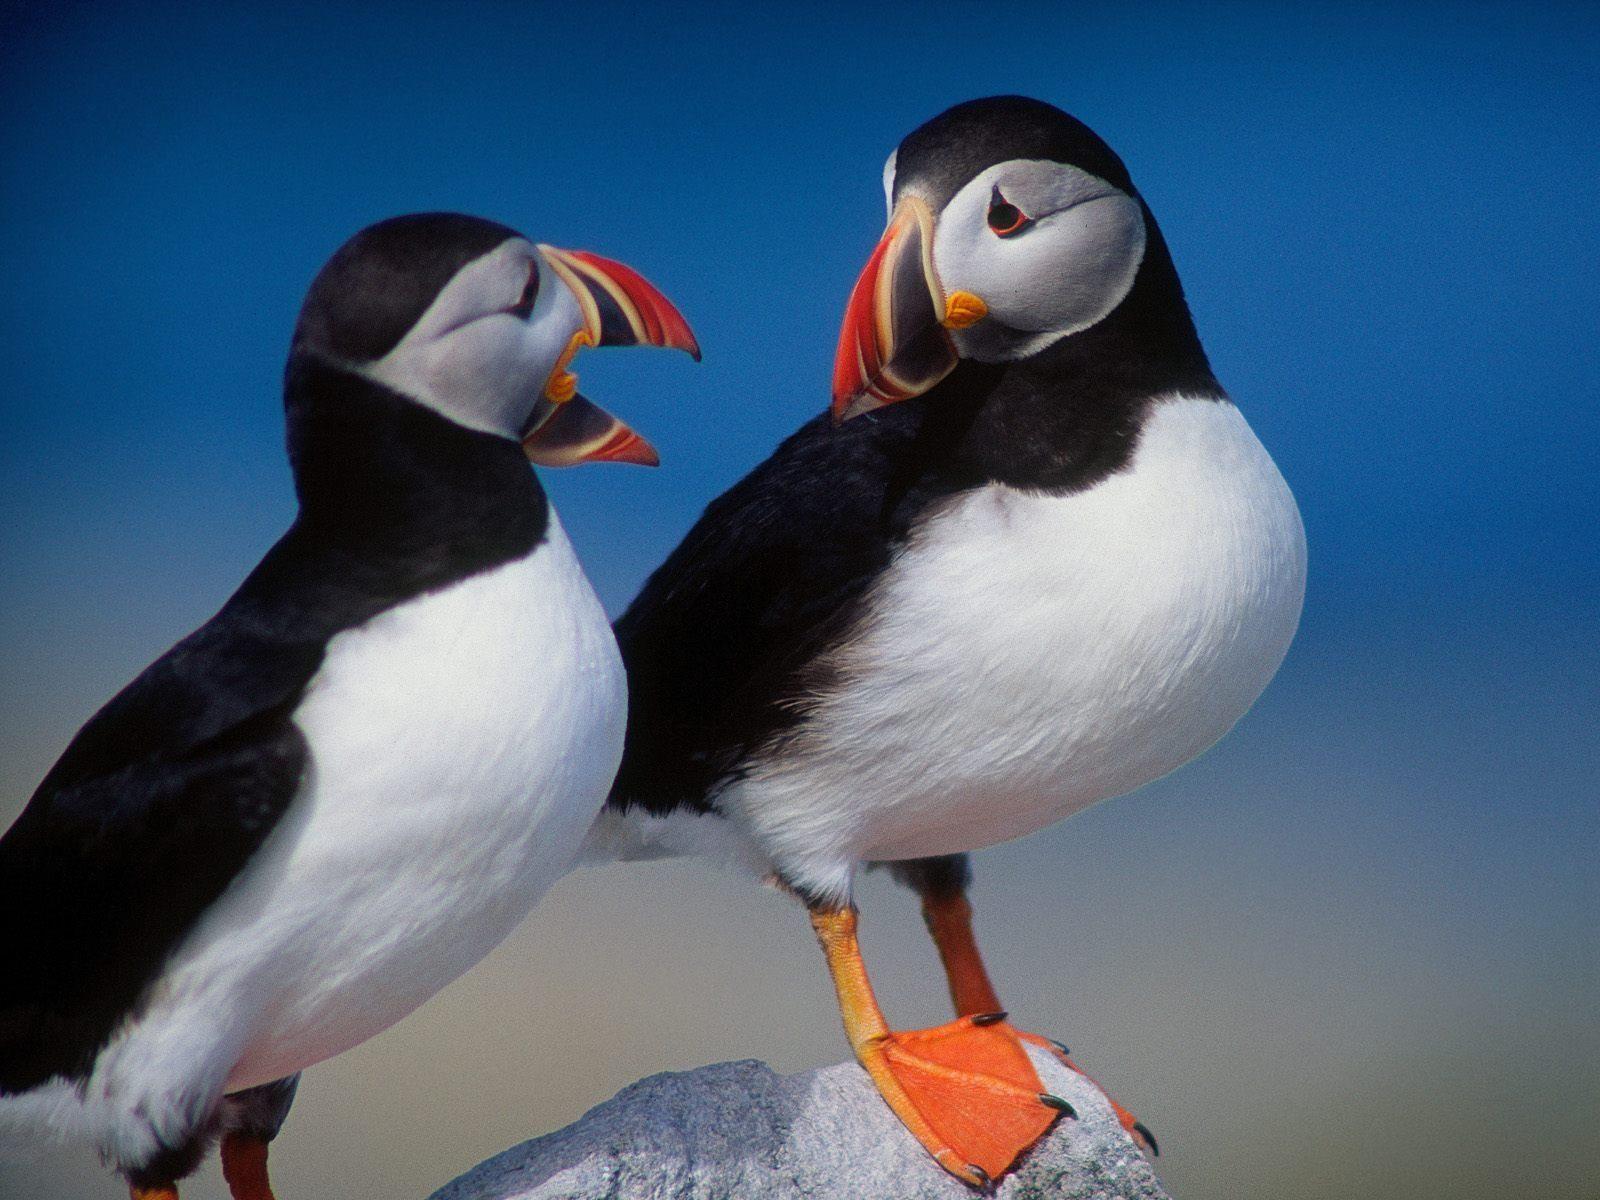 Two Birds Colorful Beaks Wallpaper 1600x1200